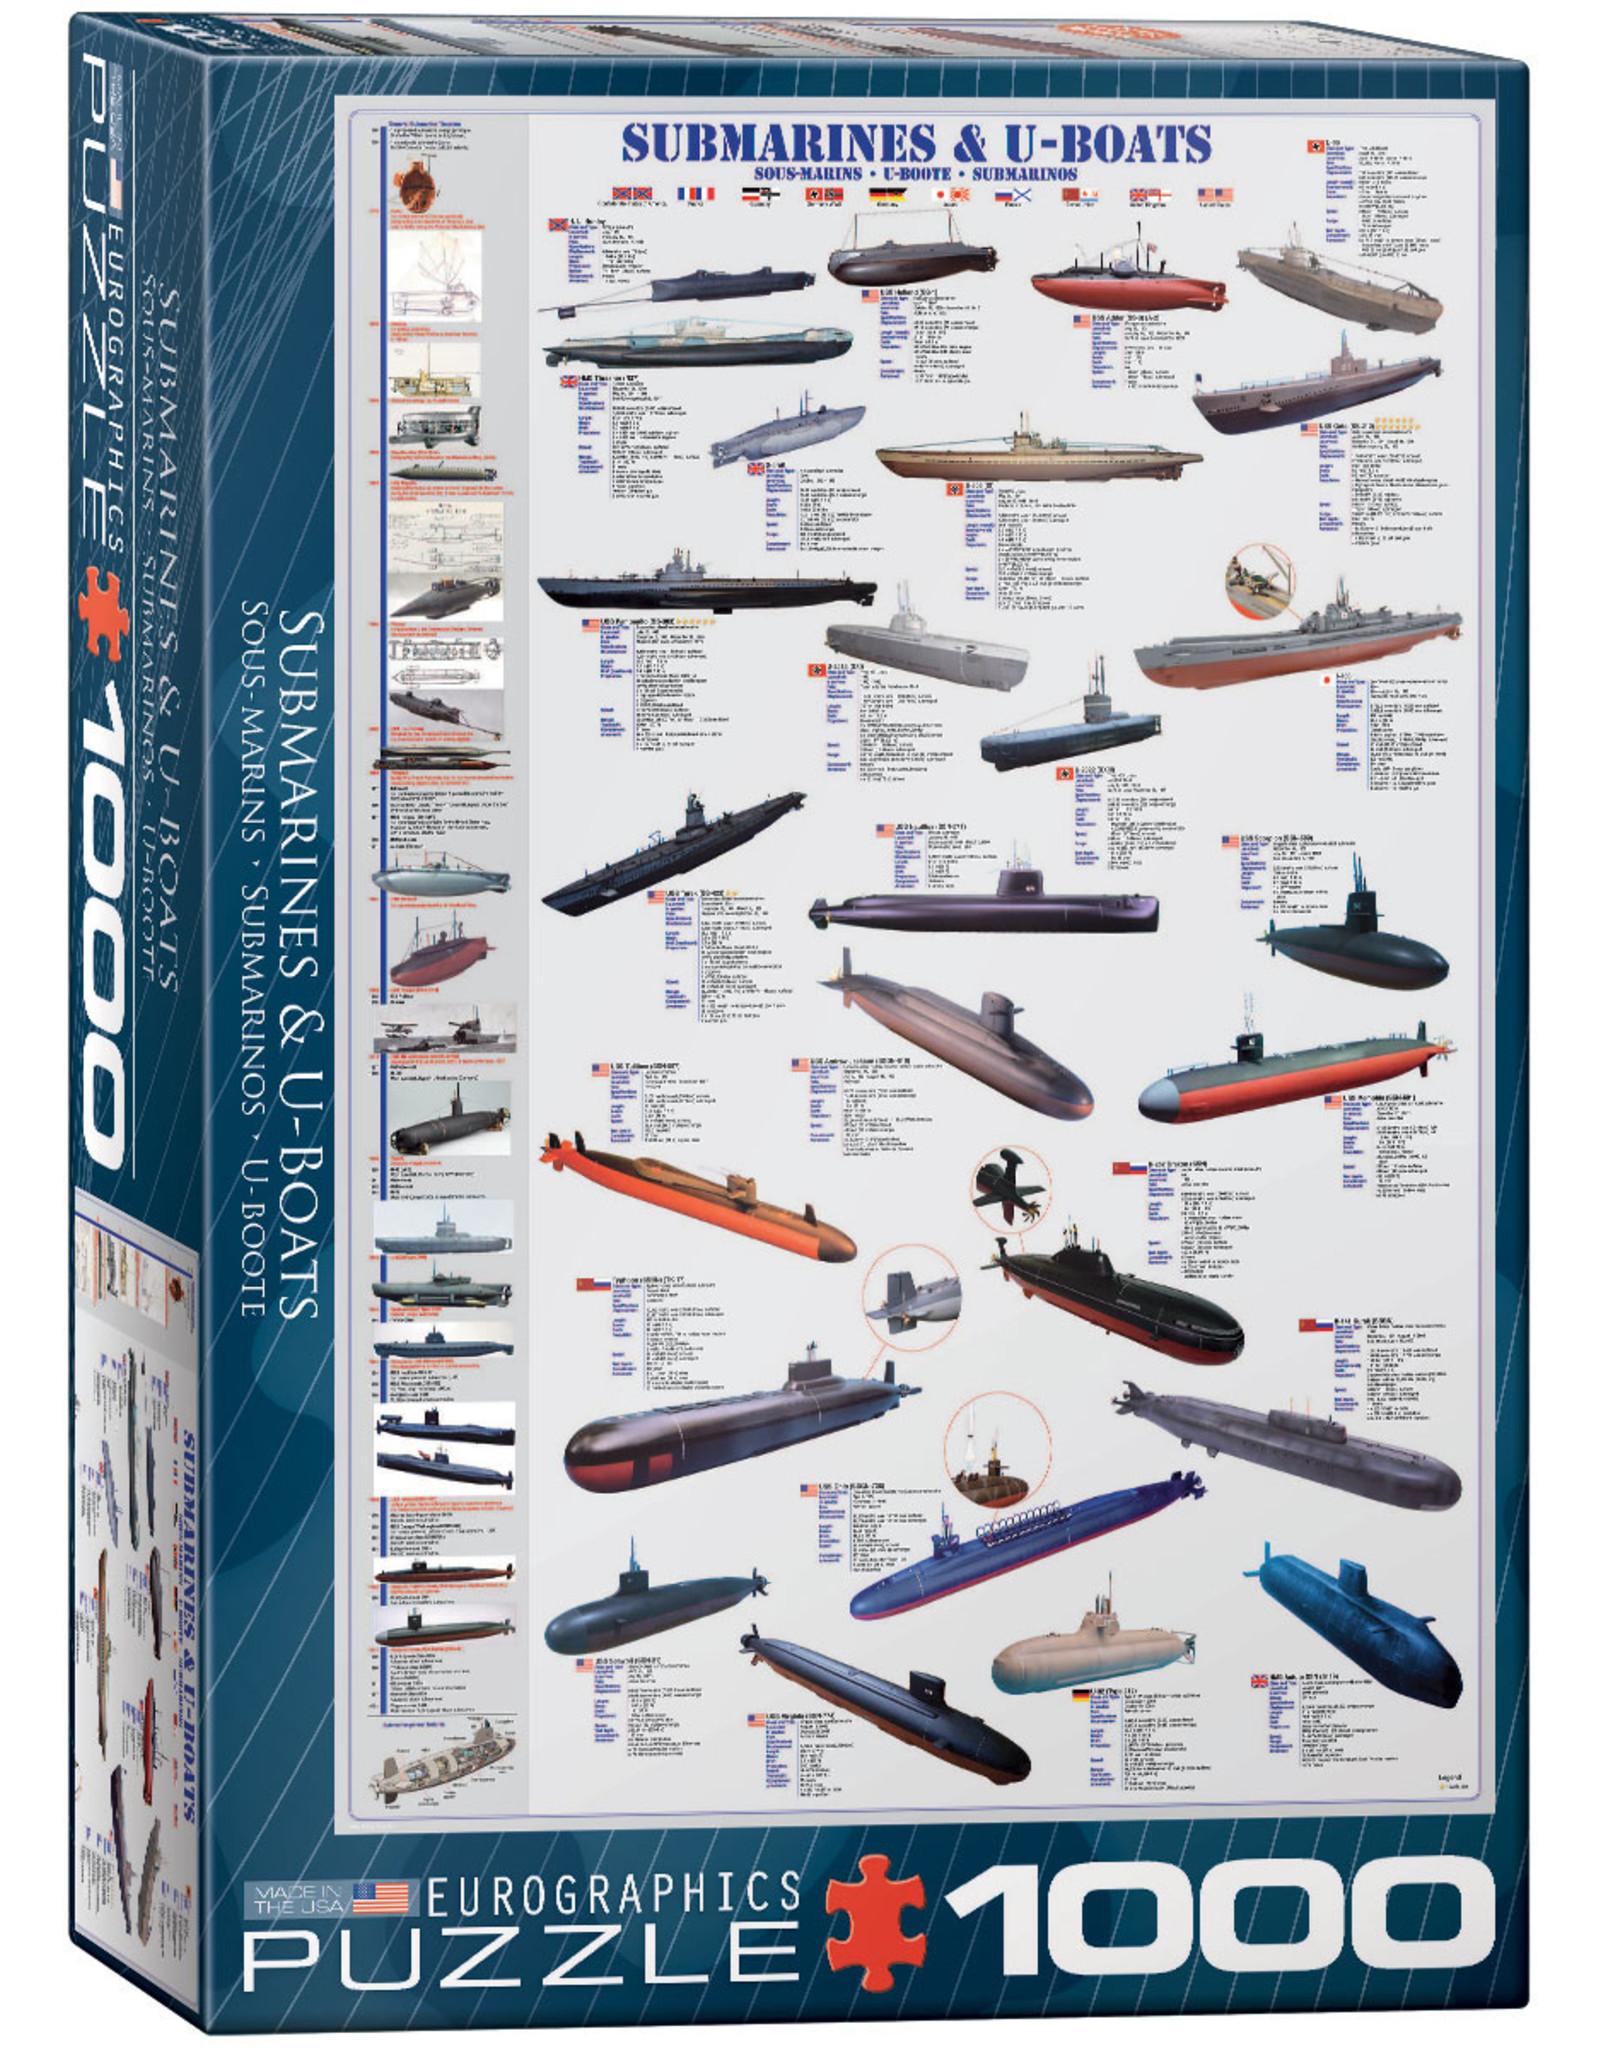 Submarines & U-Boats Puzzle